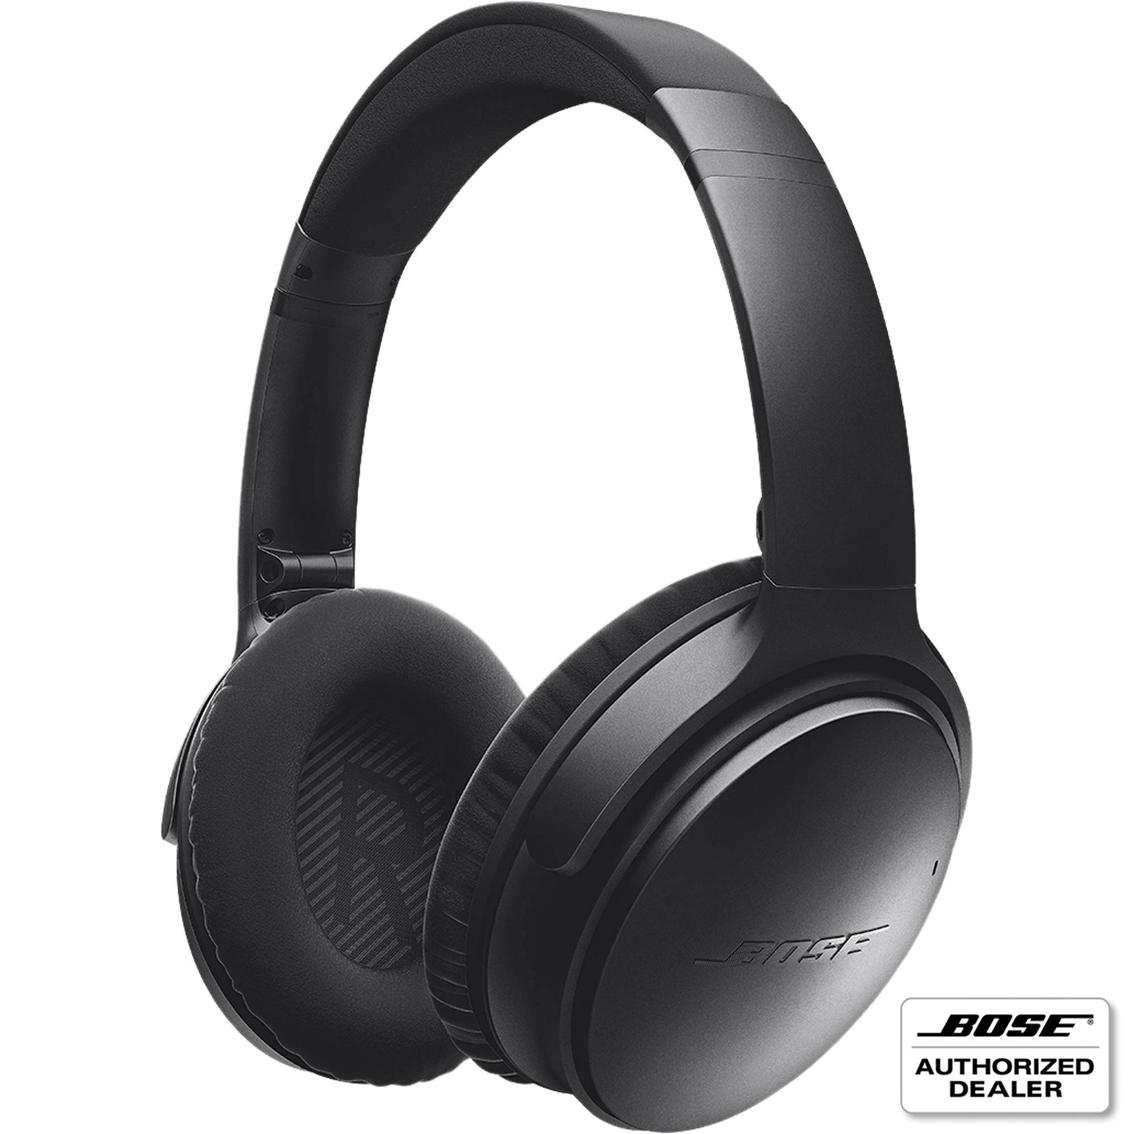 bose nfl headset. 1007 bose nfl headset